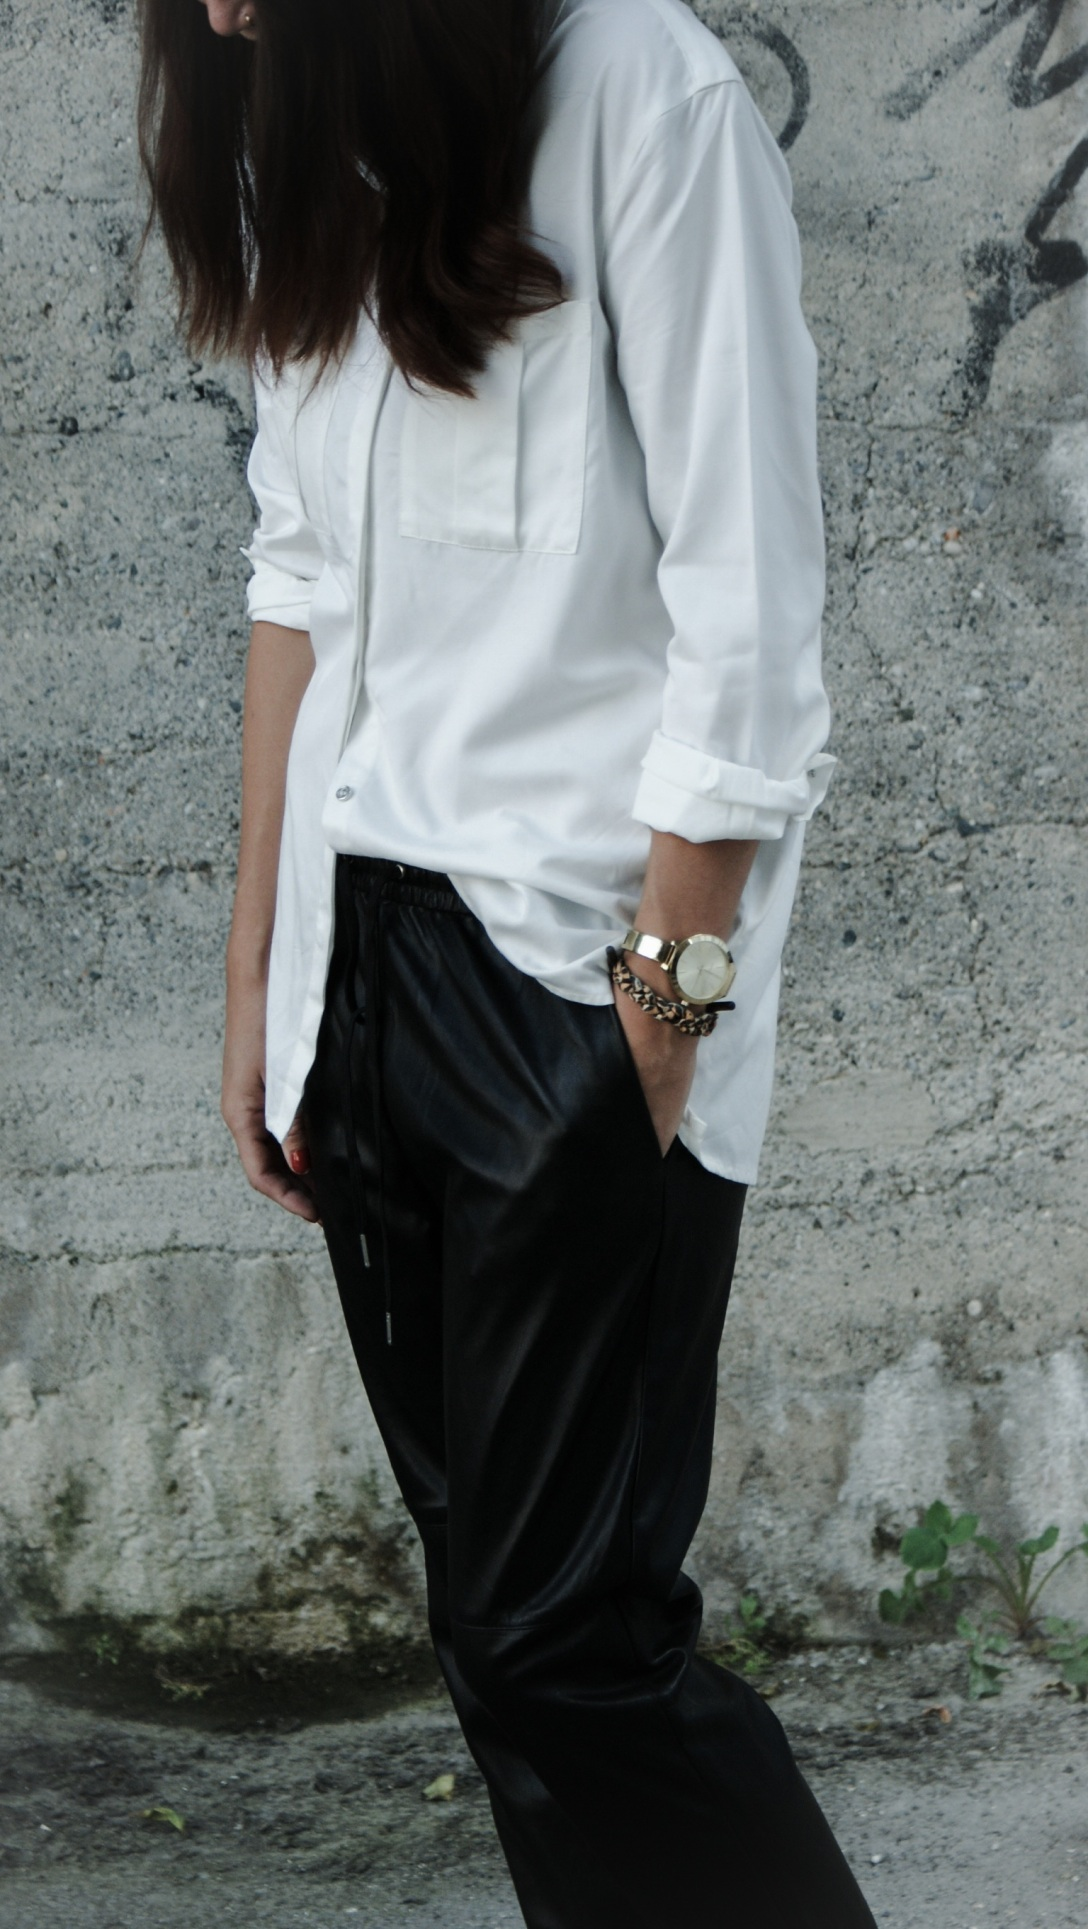 michael kors watch trend fashion streetstyle lookbook outfit zara